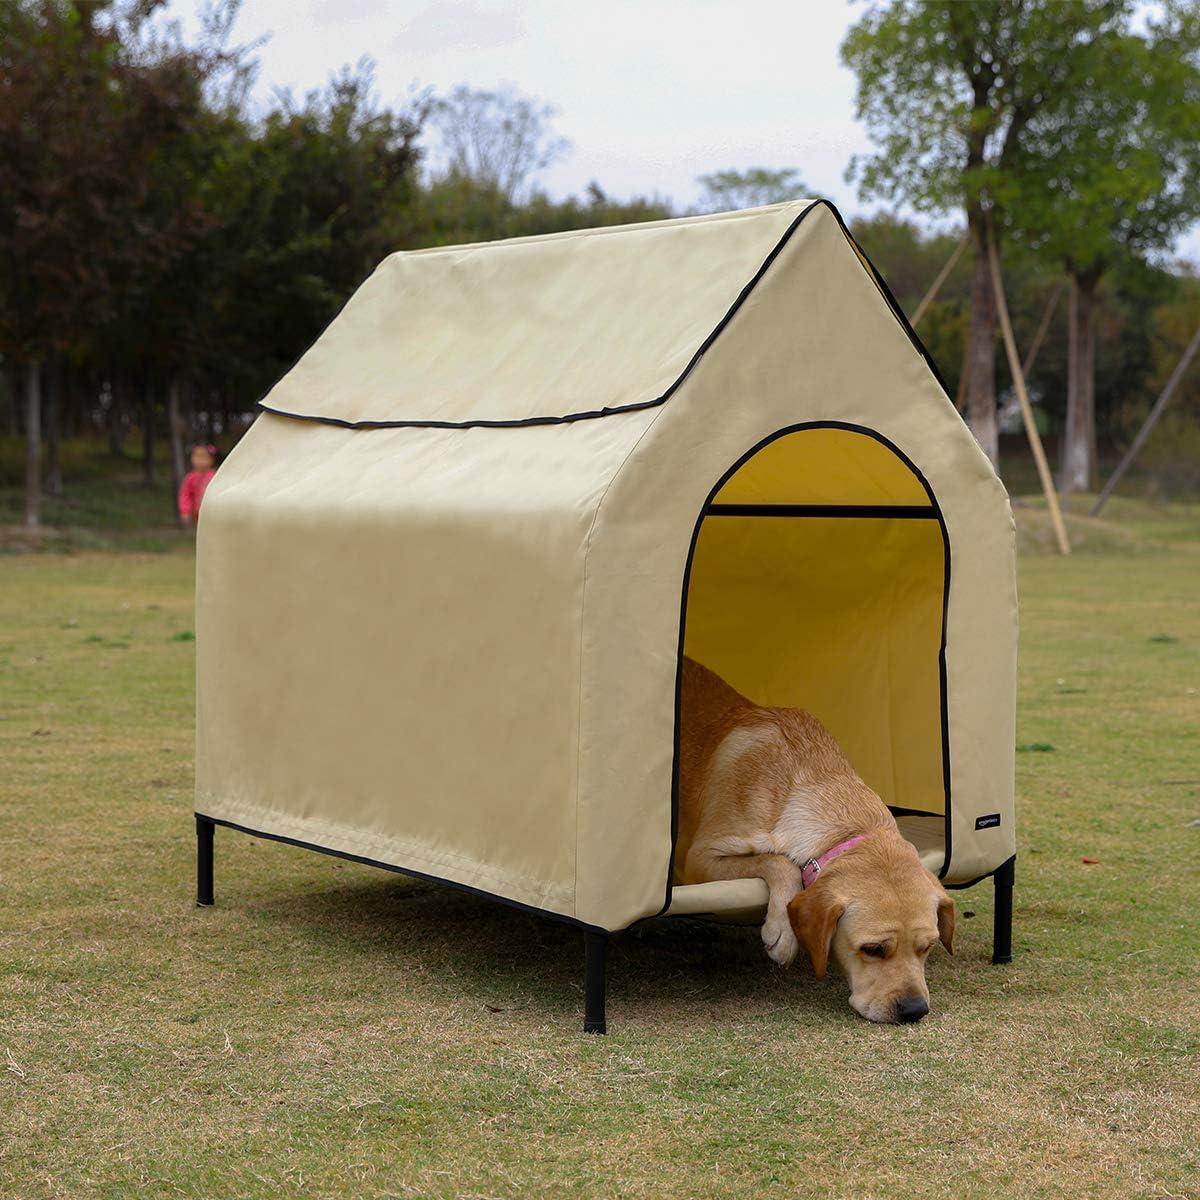 AmazonBasics Elevated Portable Pet House, Medium 43 x 35 x 30 Inches , Khaki